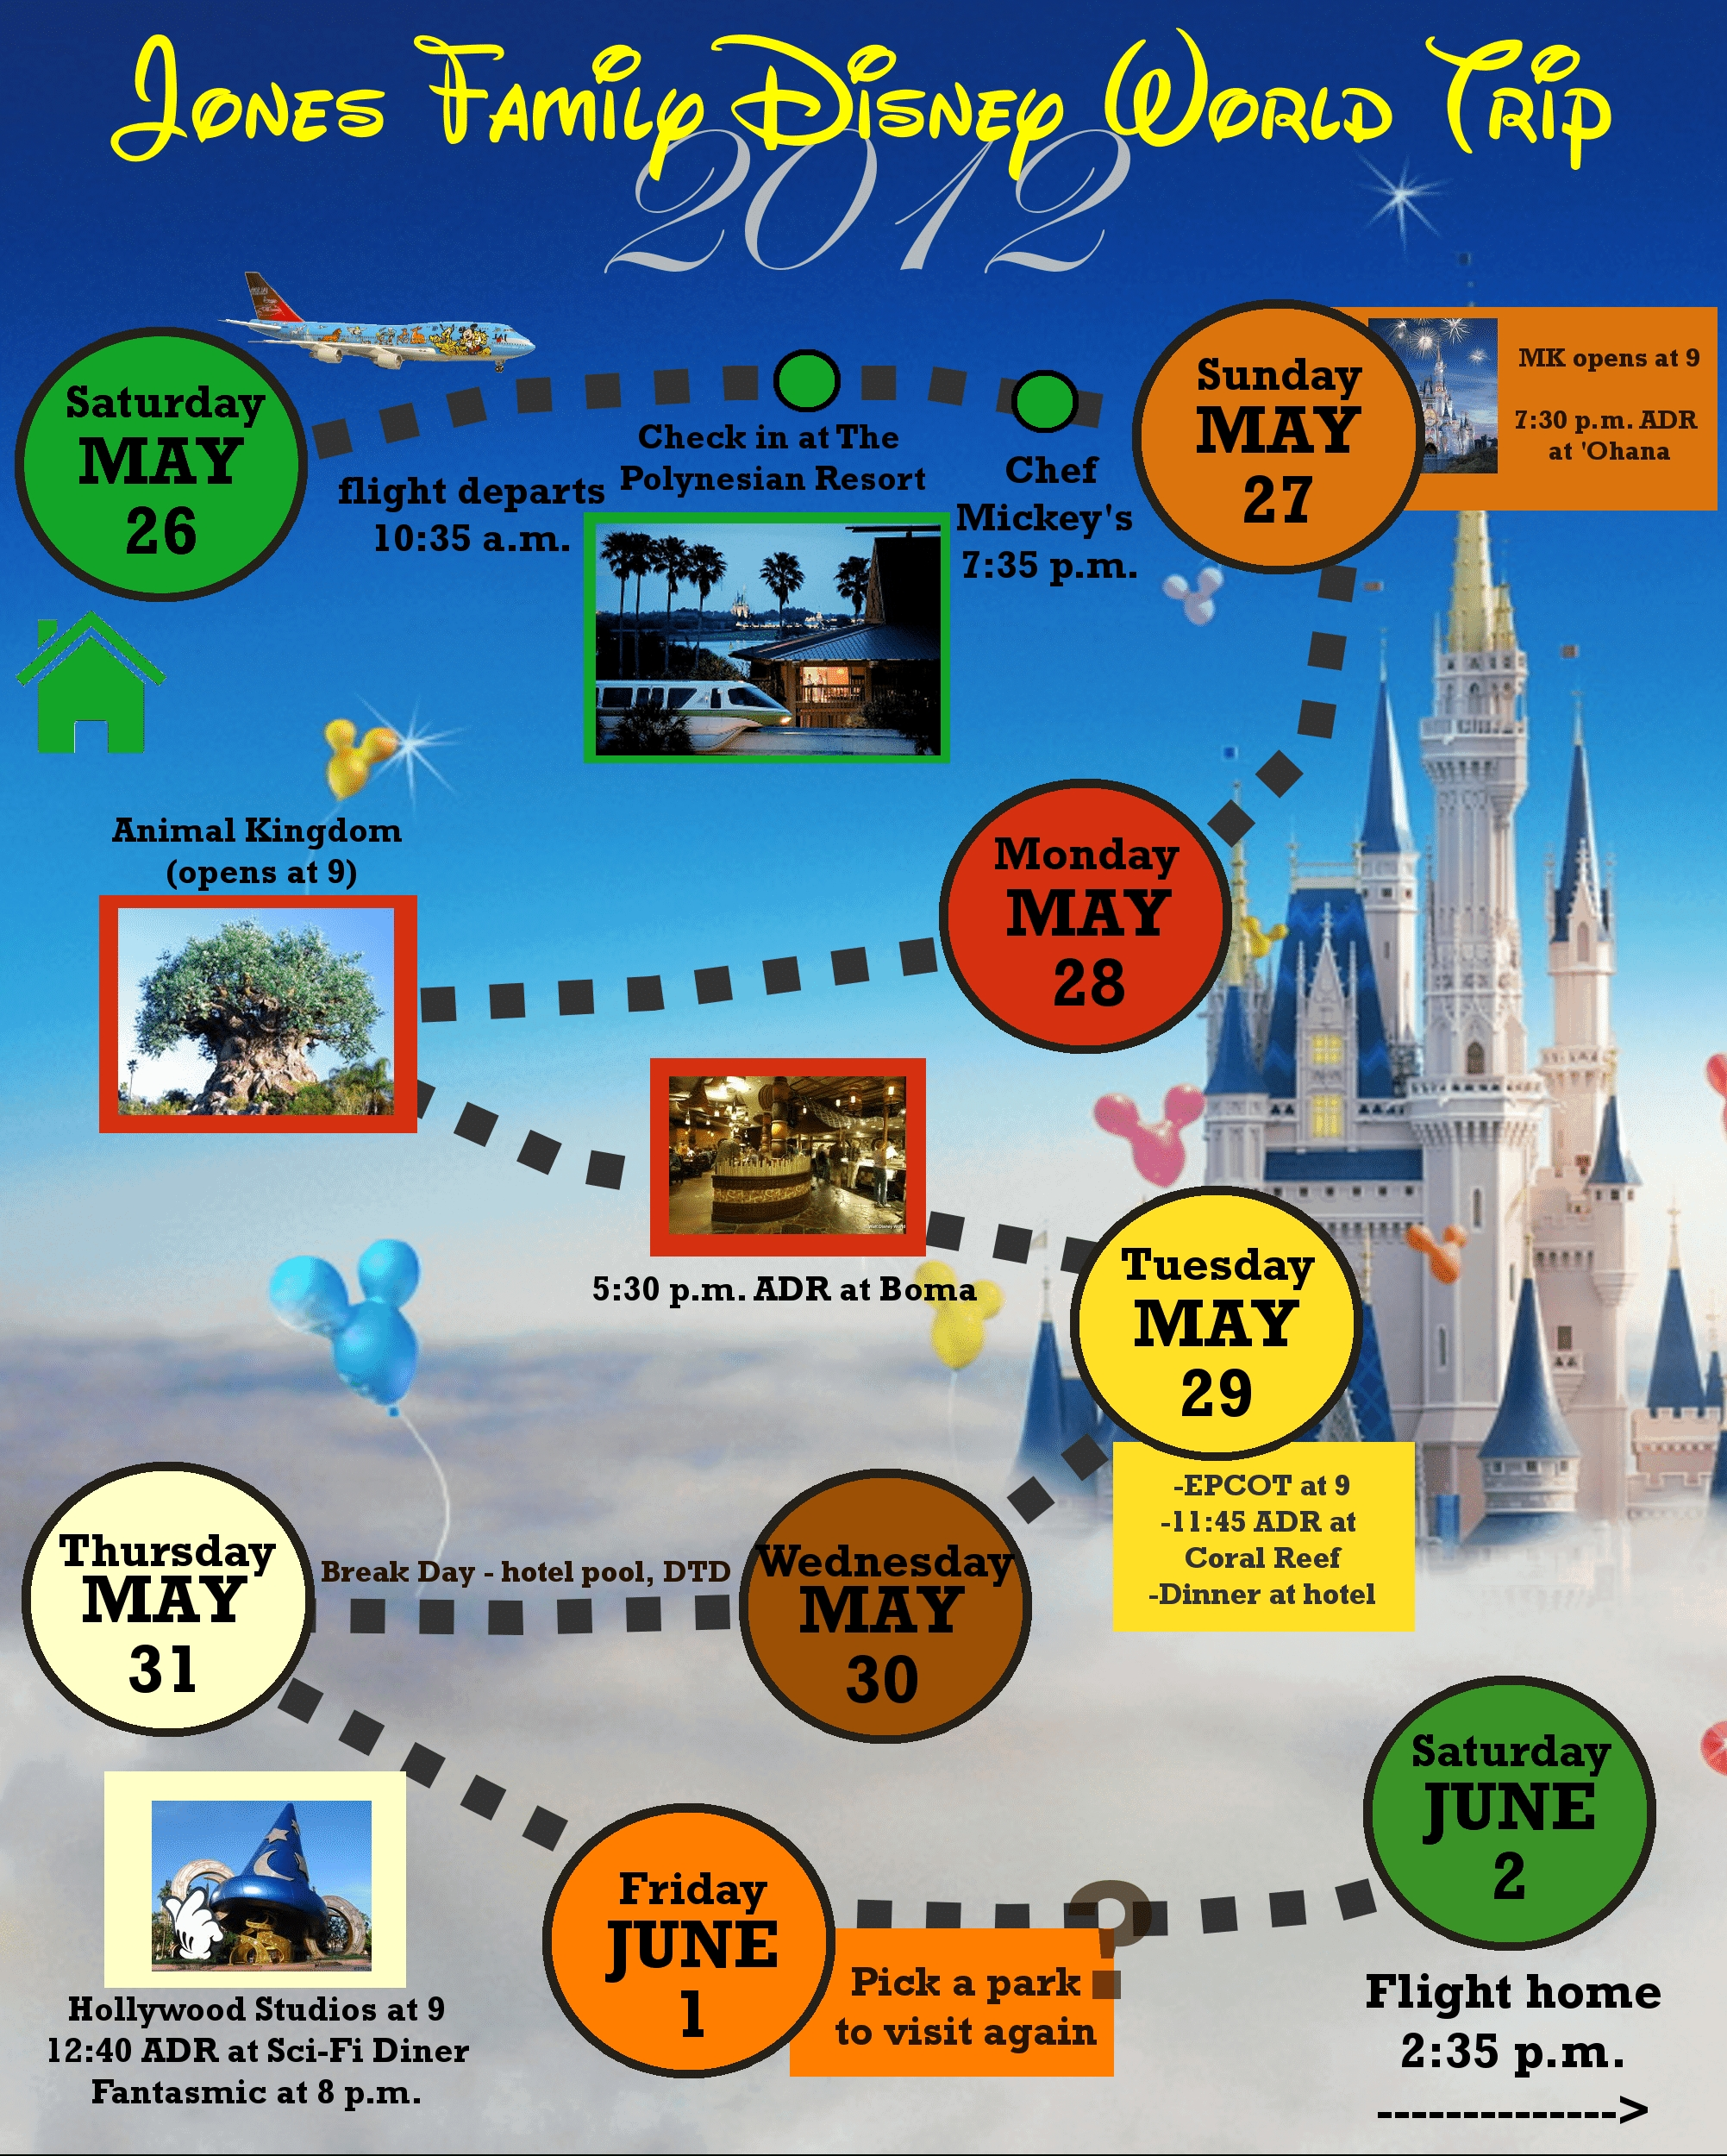 2 Custom Disney World Itinerary Templates | Wdw Prep School-Disney Free Itinerary Template